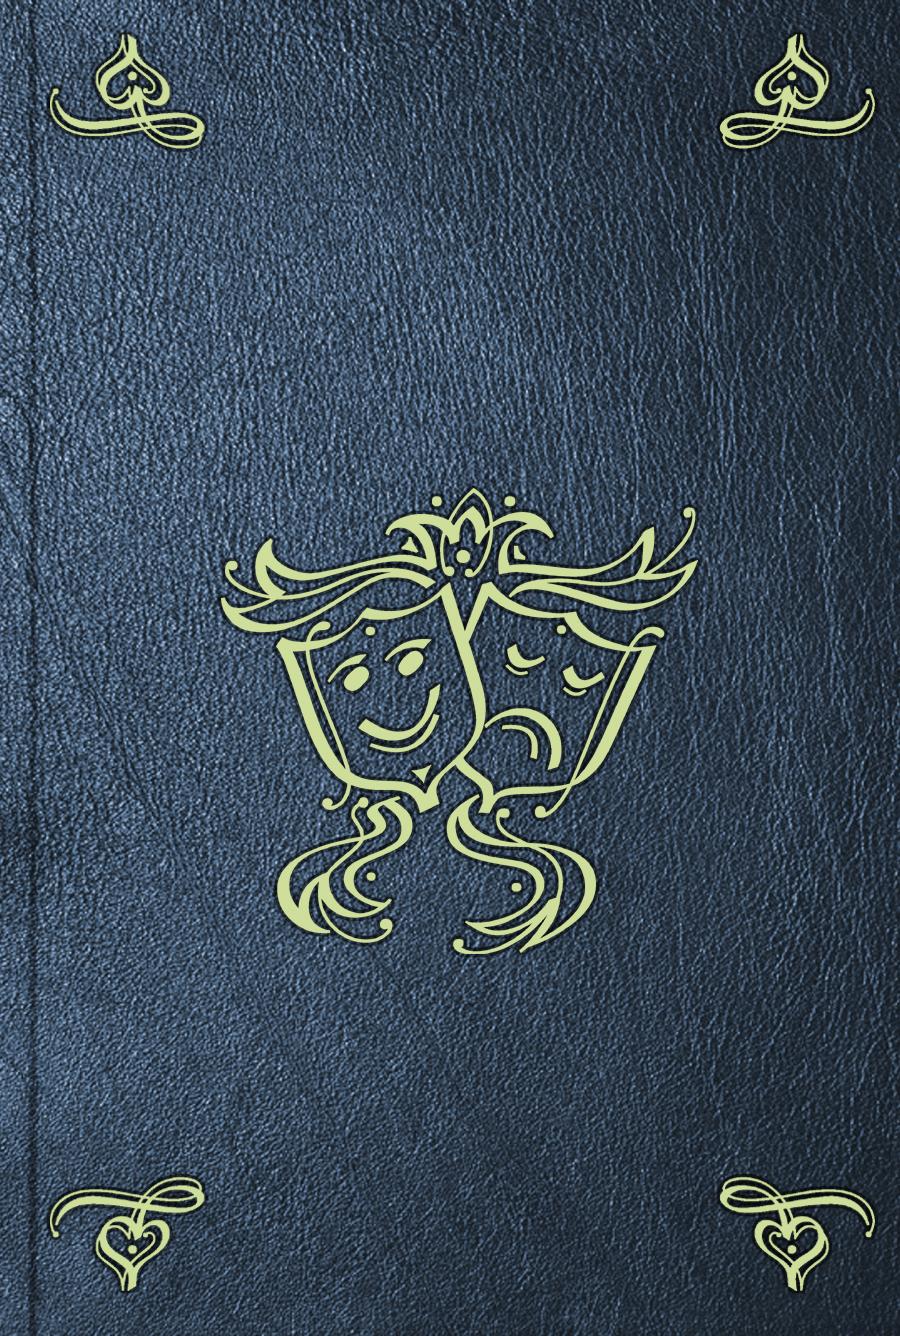 Gotthold Ephraim Lessing Emilia Galotti: Trauerspiel декор cir via emilia rivalta losanga lato 20 grigio 14x34